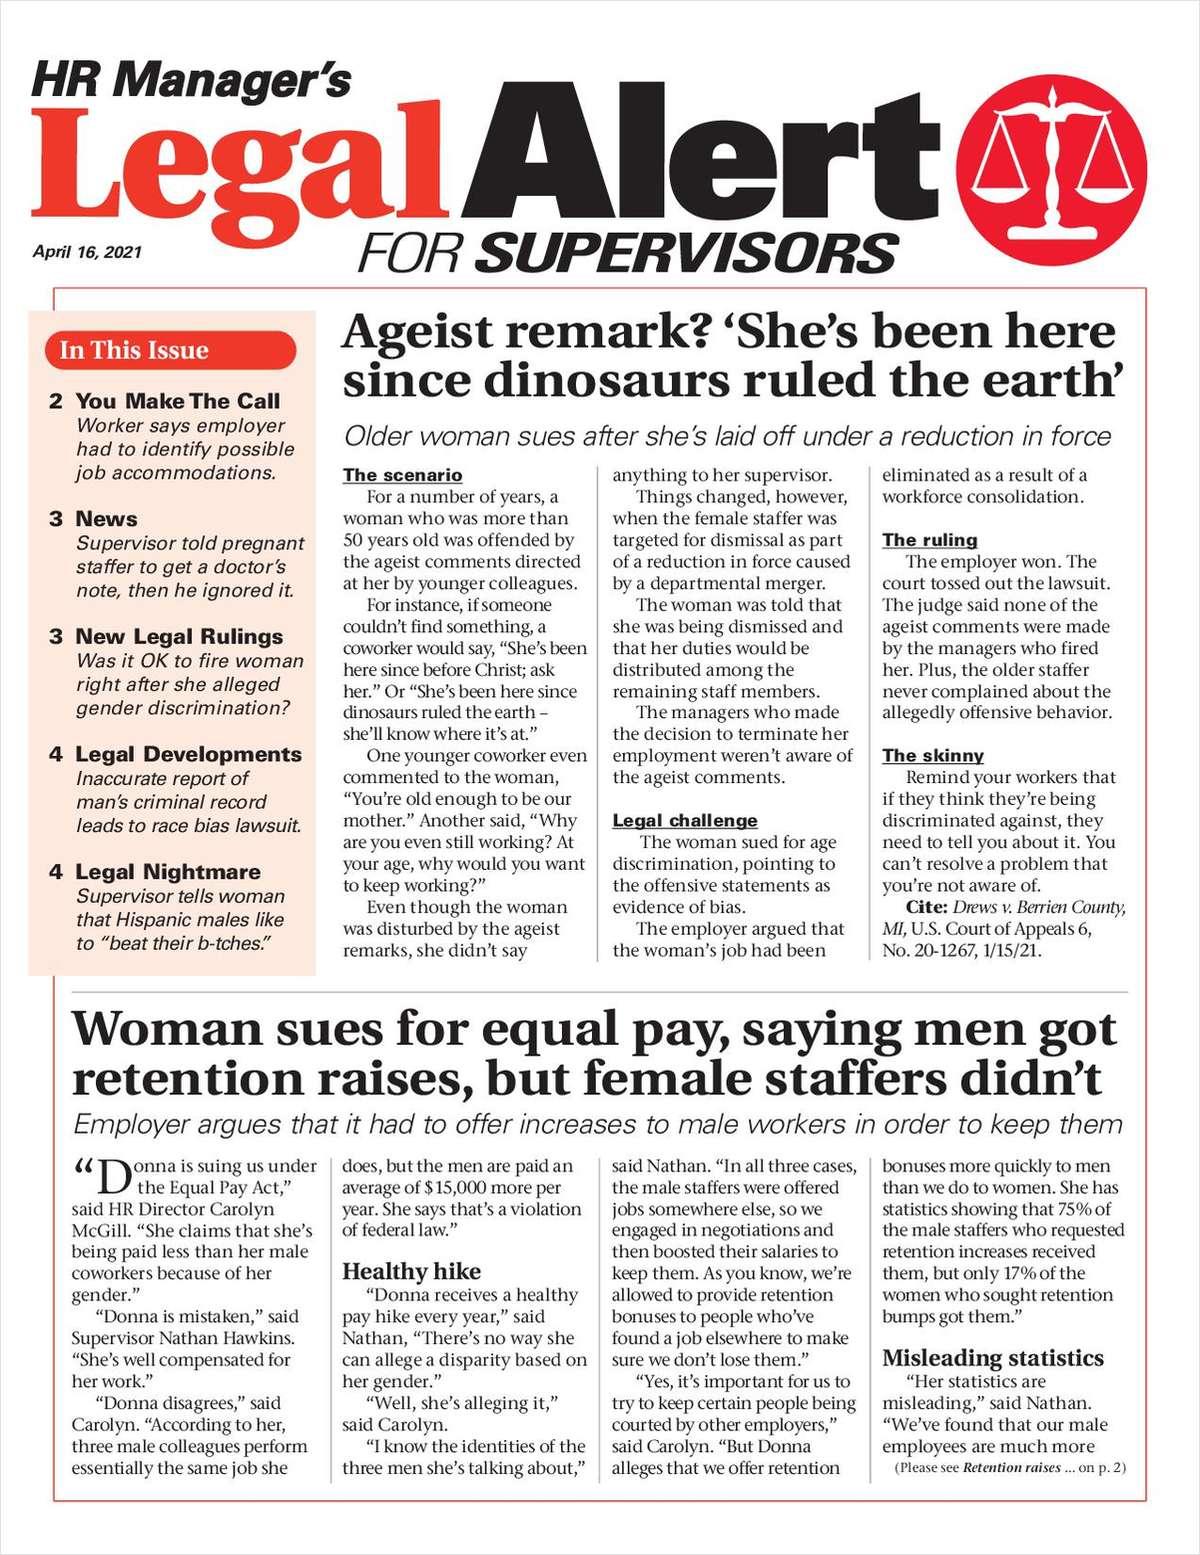 HR Manager's Legal Alert for Supervisors Newsletter: April 16 Edition